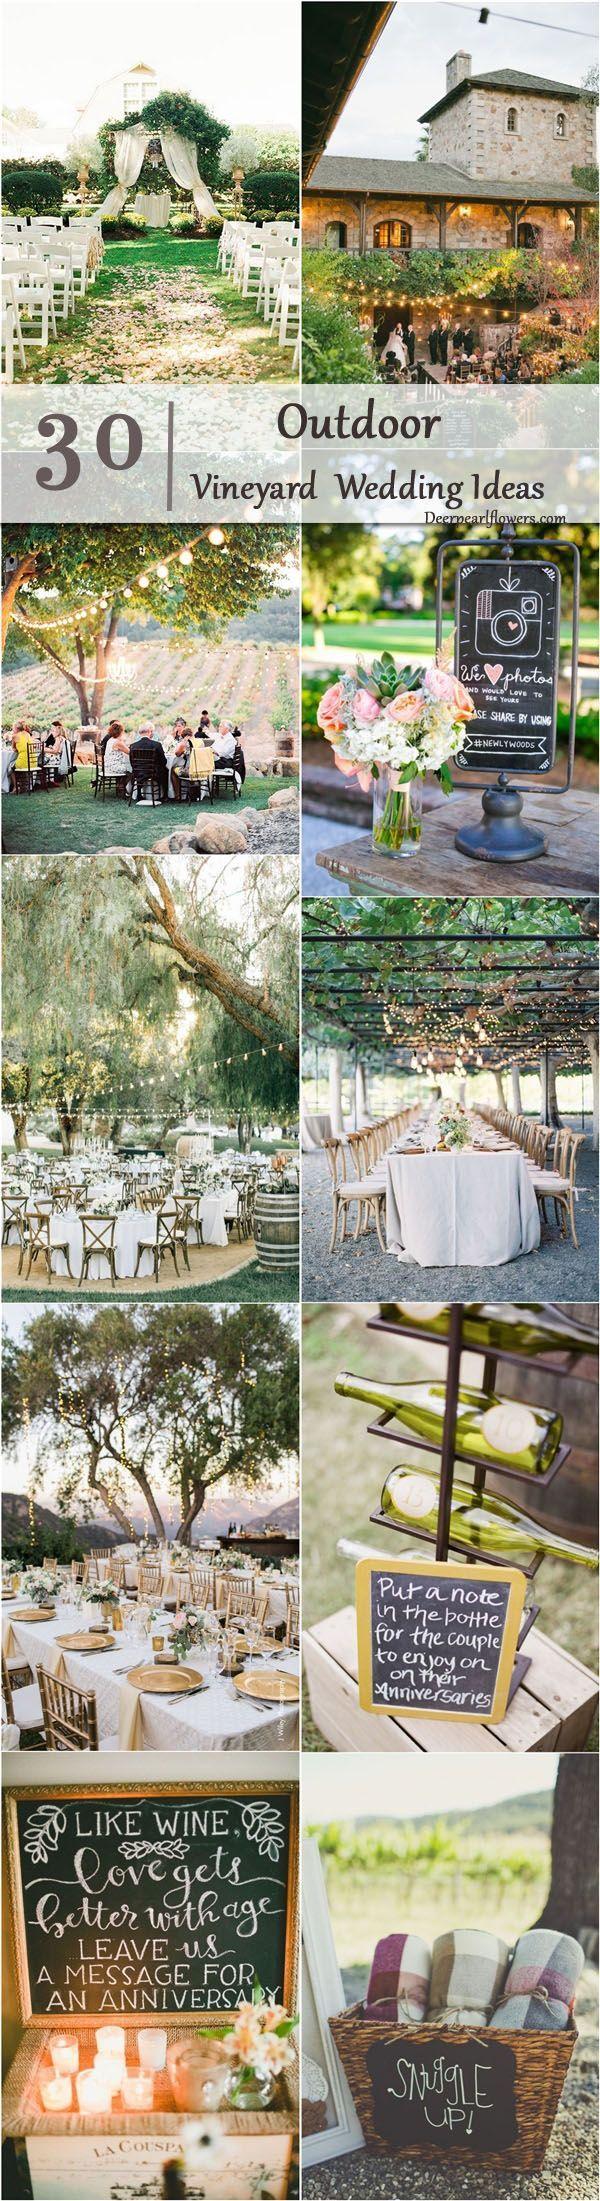 Butler barn wedding oregon   best Vineyard Weddings images on Pinterest  Blue ridge